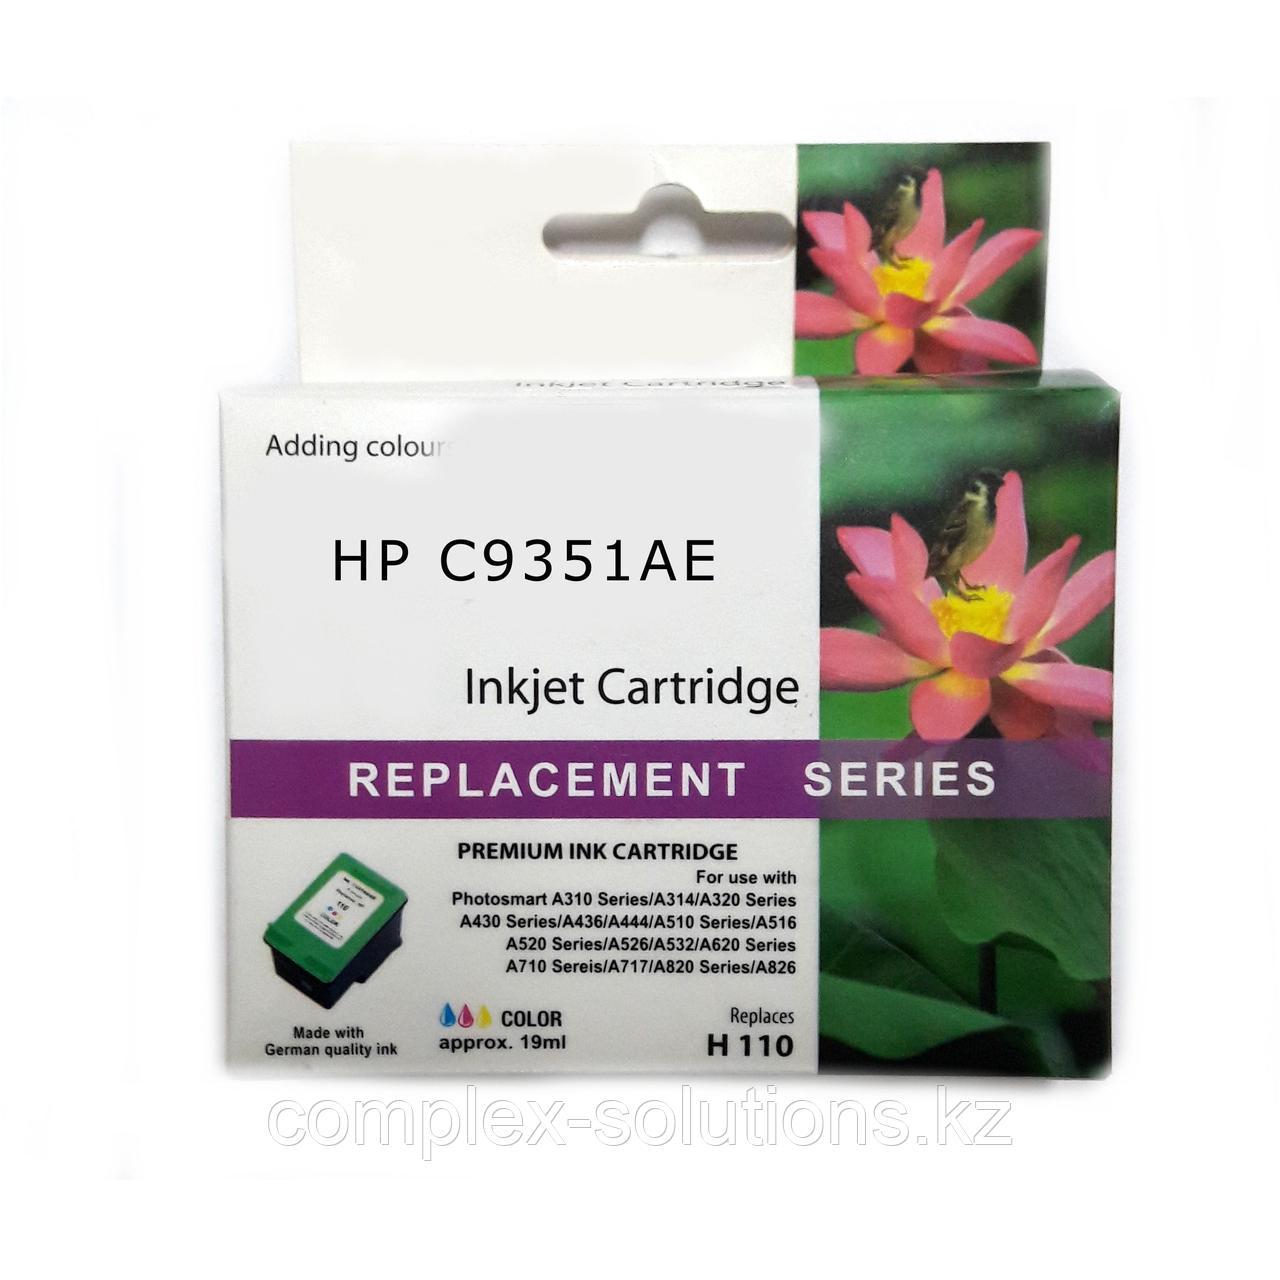 Картридж HP C9351AE Black №21 JET TEK | [качественный дубликат]